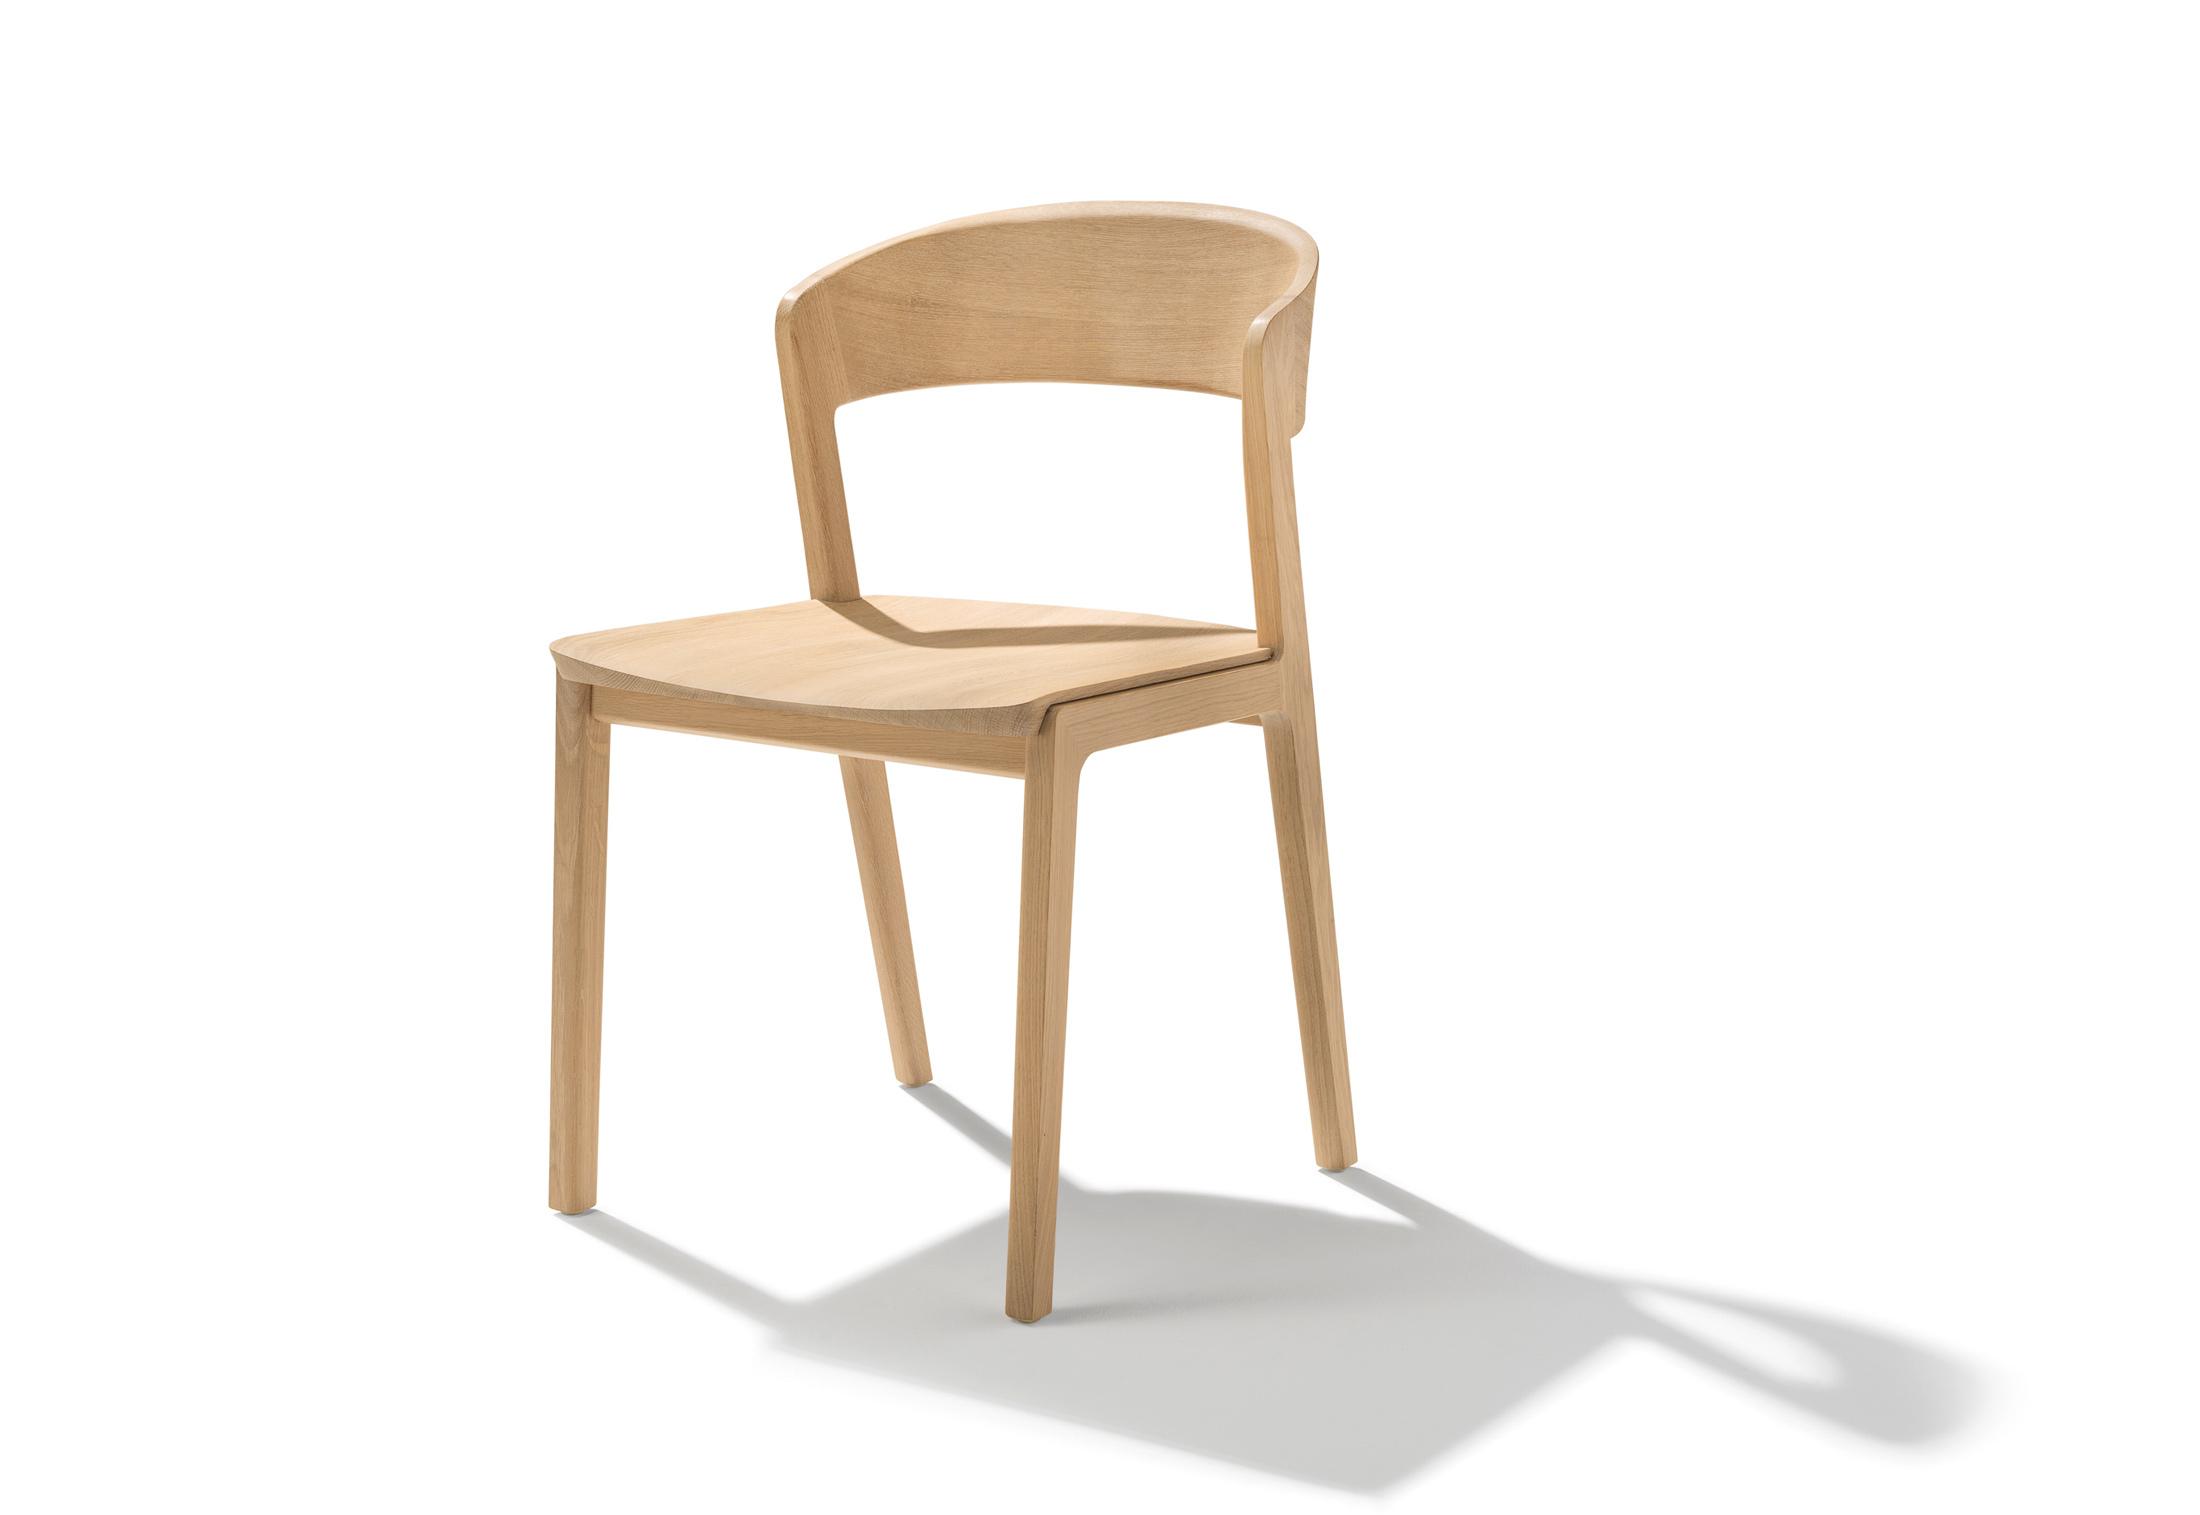 mylon stuhl von team 7 stylepark. Black Bedroom Furniture Sets. Home Design Ideas